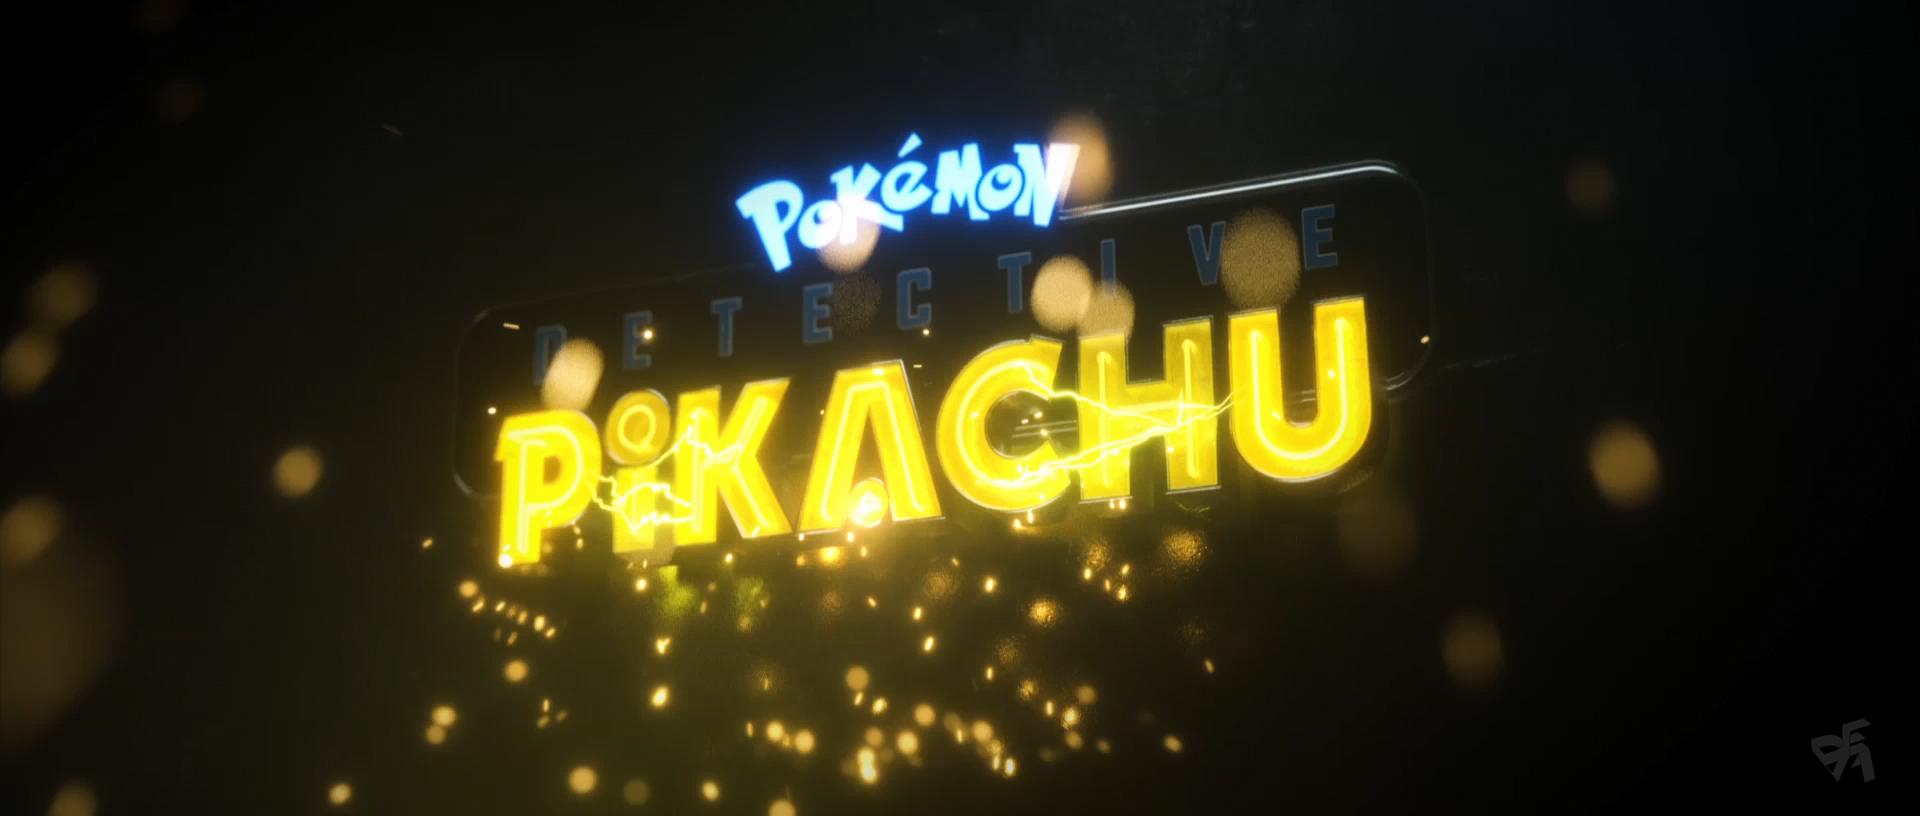 DetPikachu_TRAILER2_04.jpg